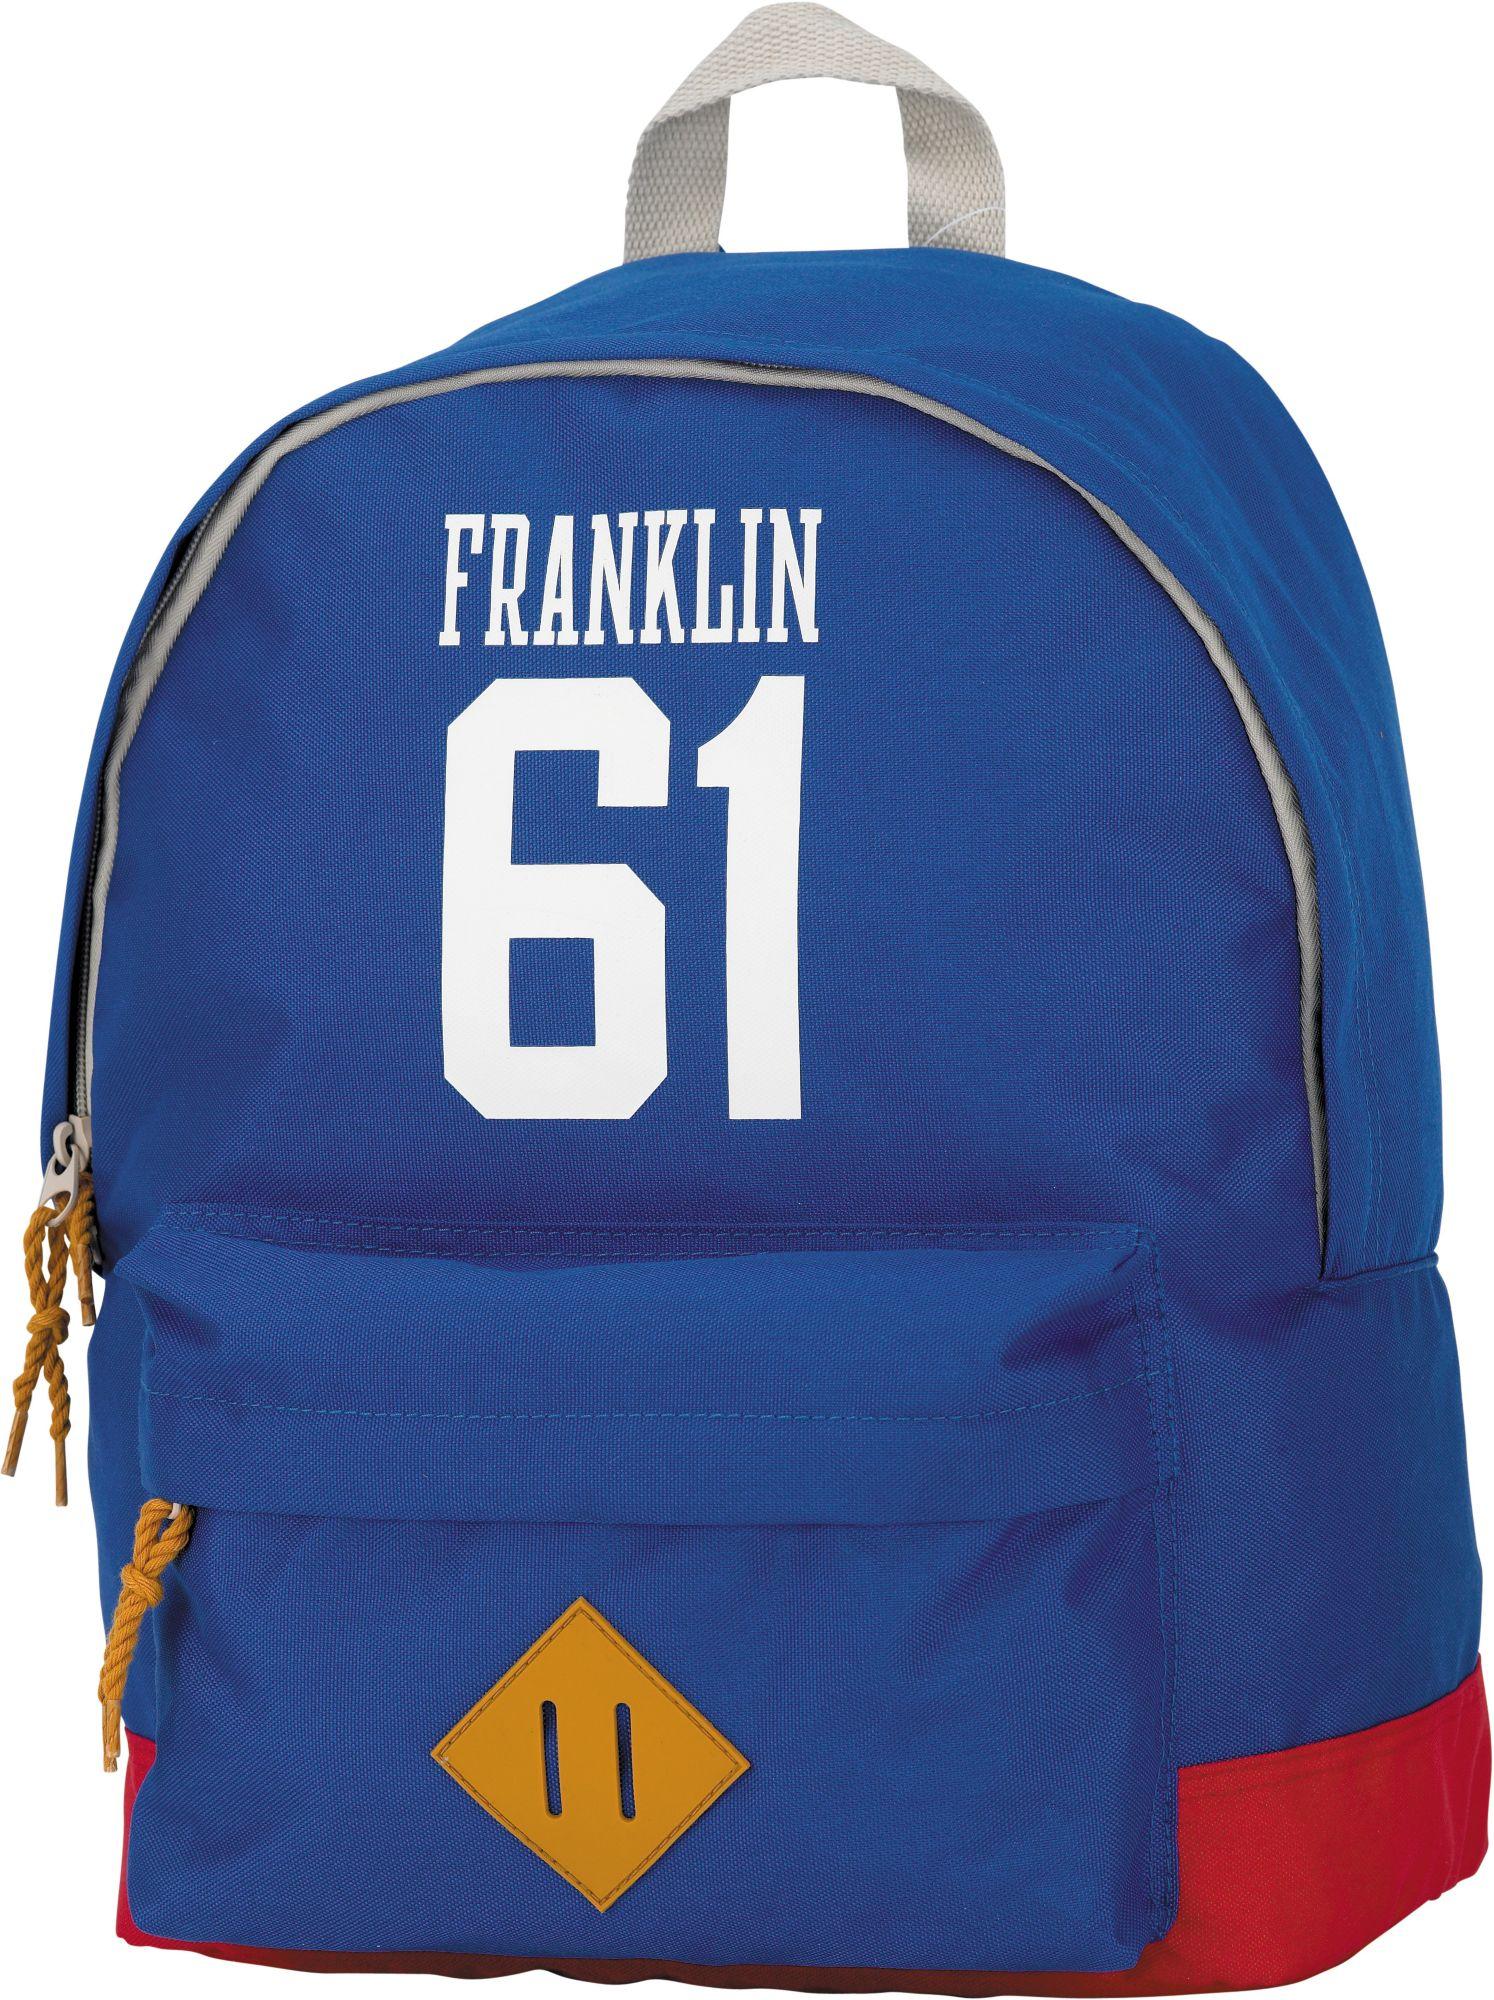 FRANKLIN MARSHALL Franklin & Marshall, Rucksack mit gummiertem Bodenschutz, »Boys Backpack hellblau, groß«